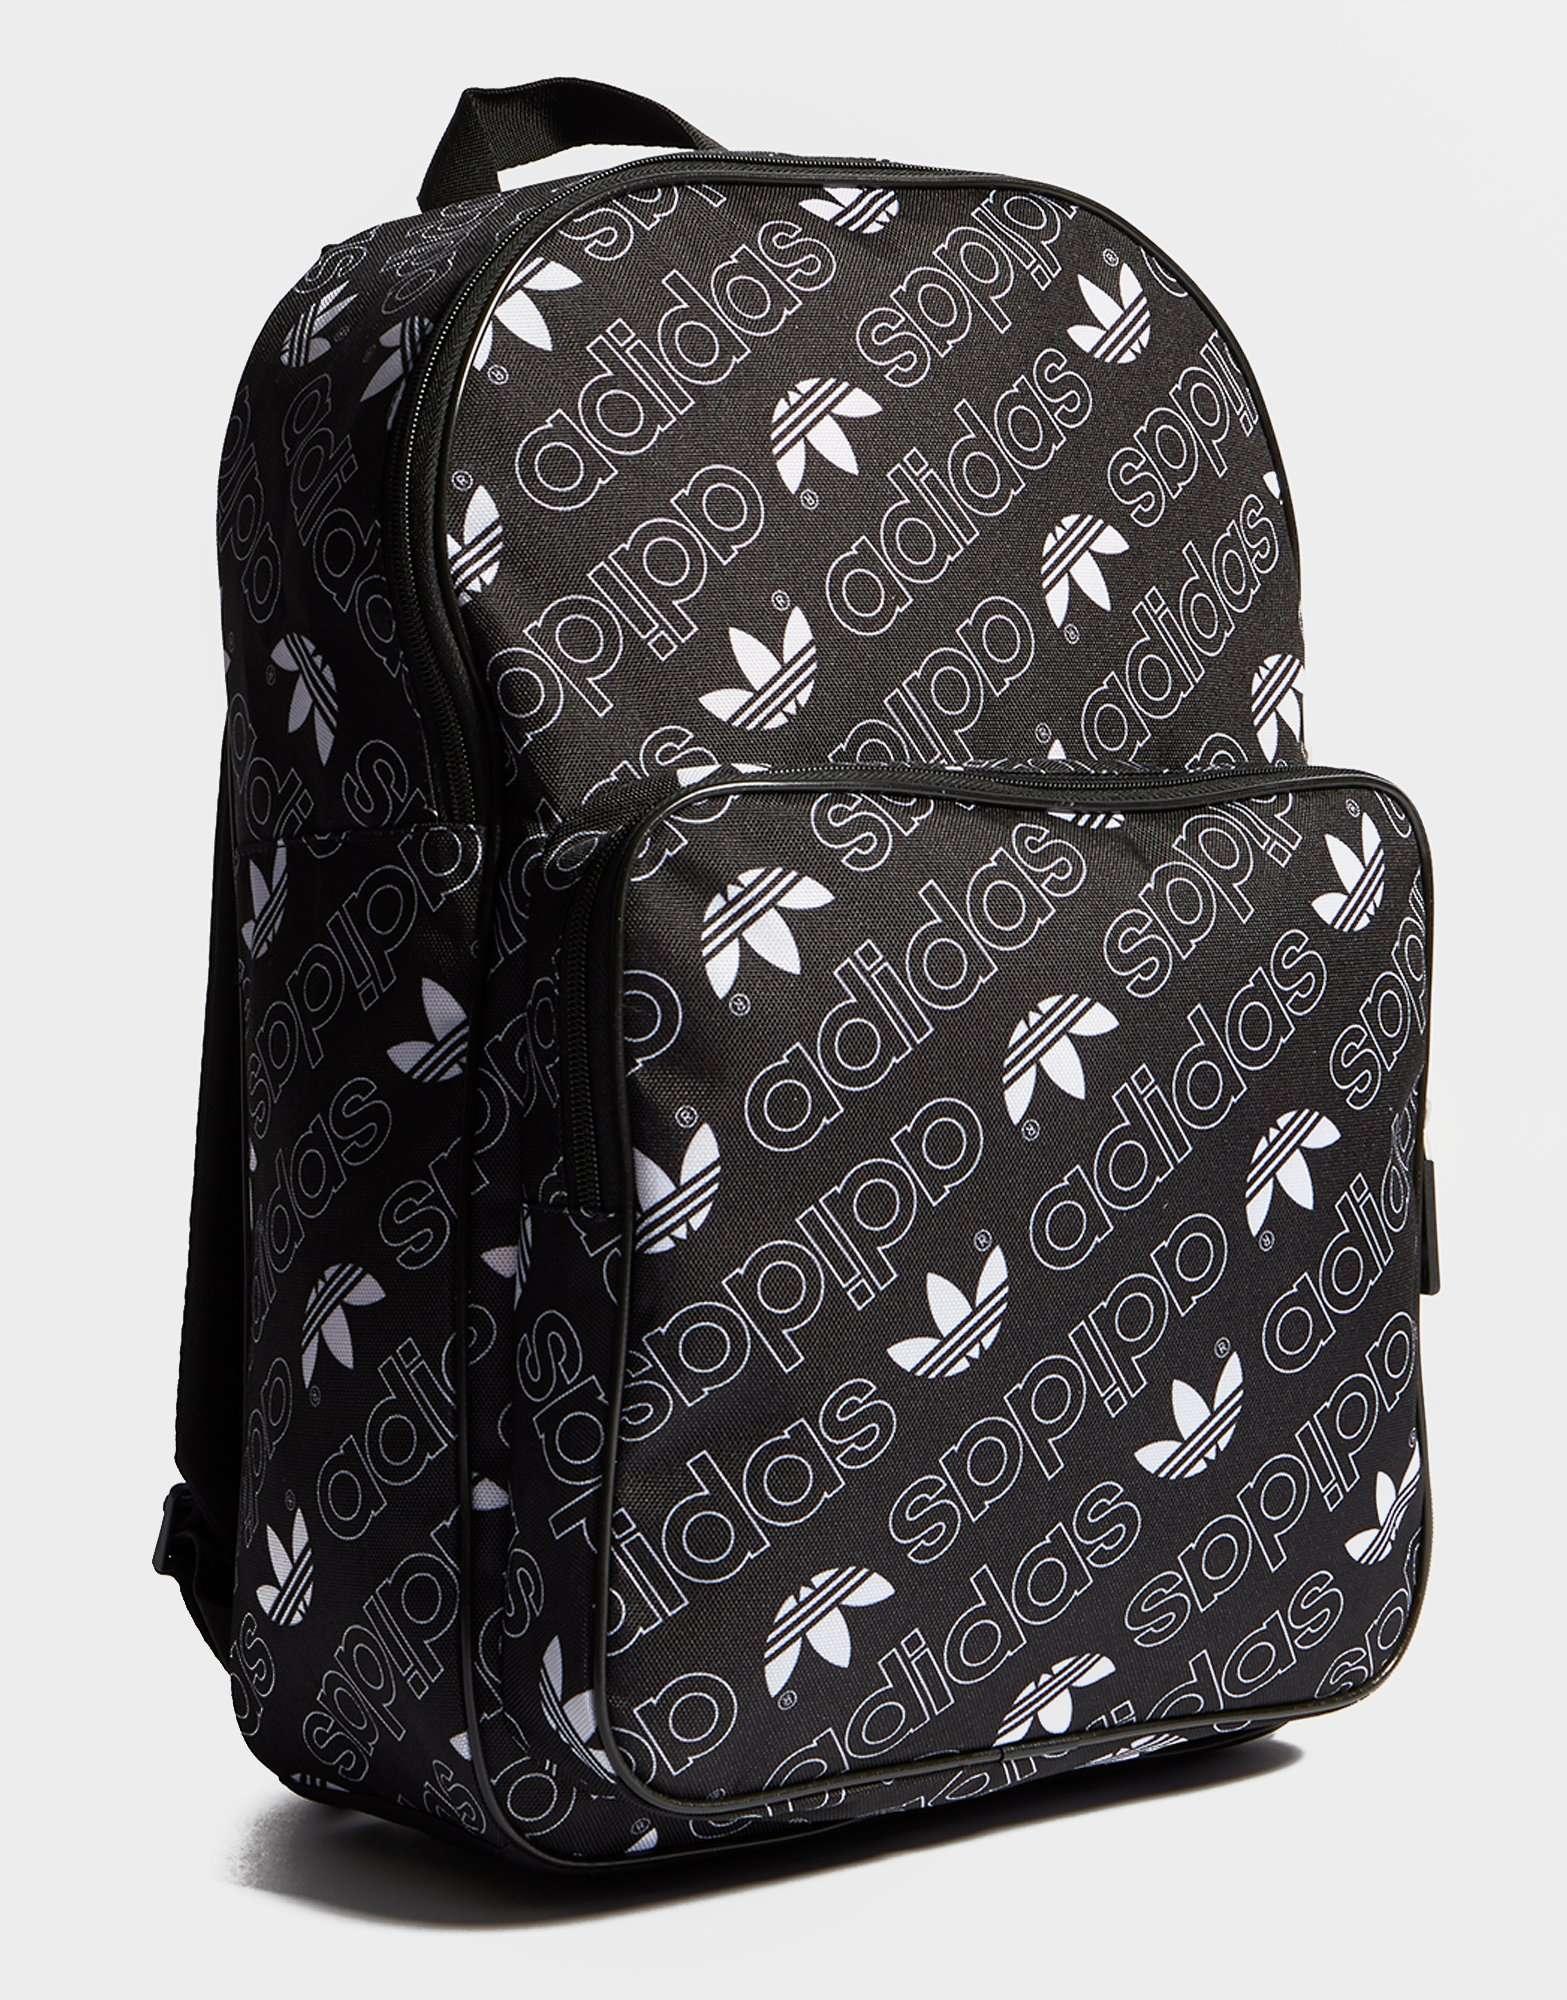 Adidas Originals - repetir mochila JD Sports